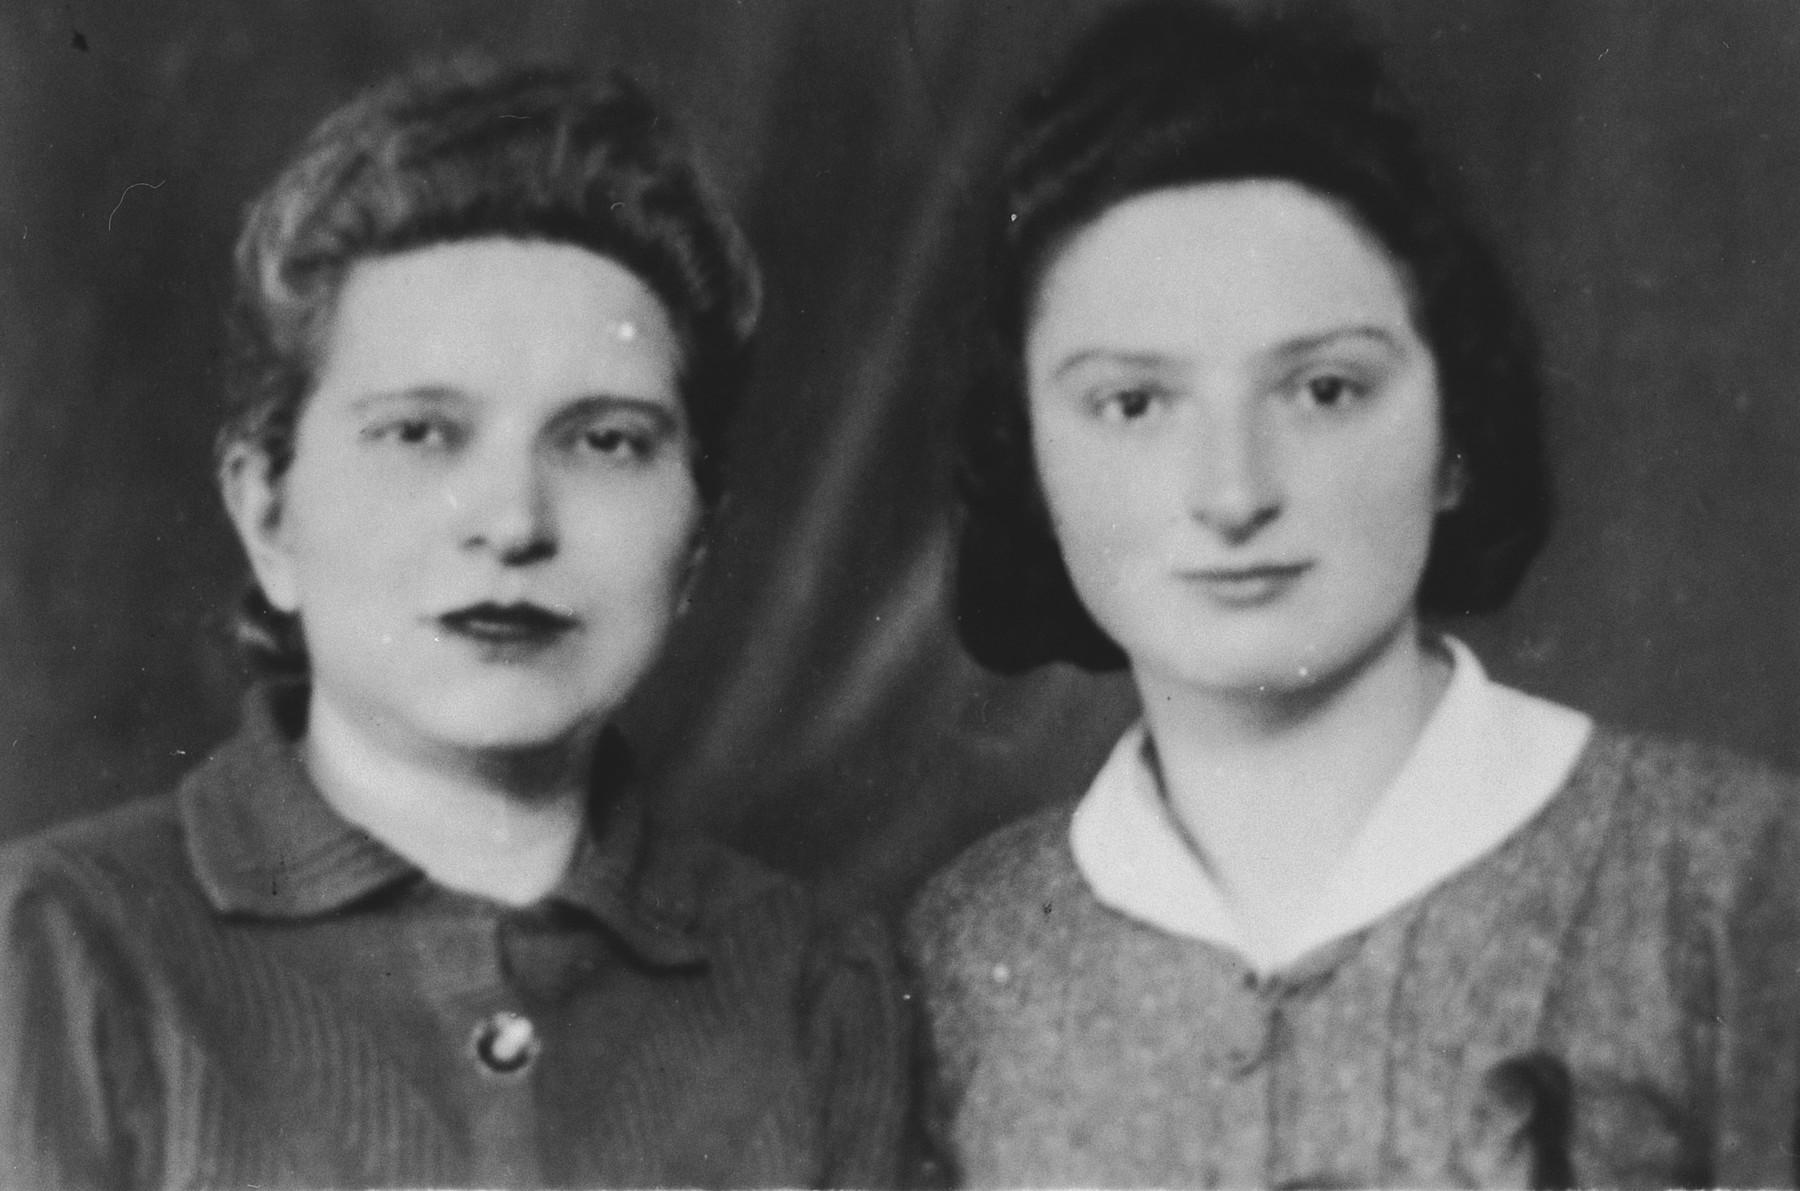 Identification photograph taken of Luba and Genia Prawer and sent to Alfred Schwartzbaum in Switzerland so that the women could obtain Honduran passports.